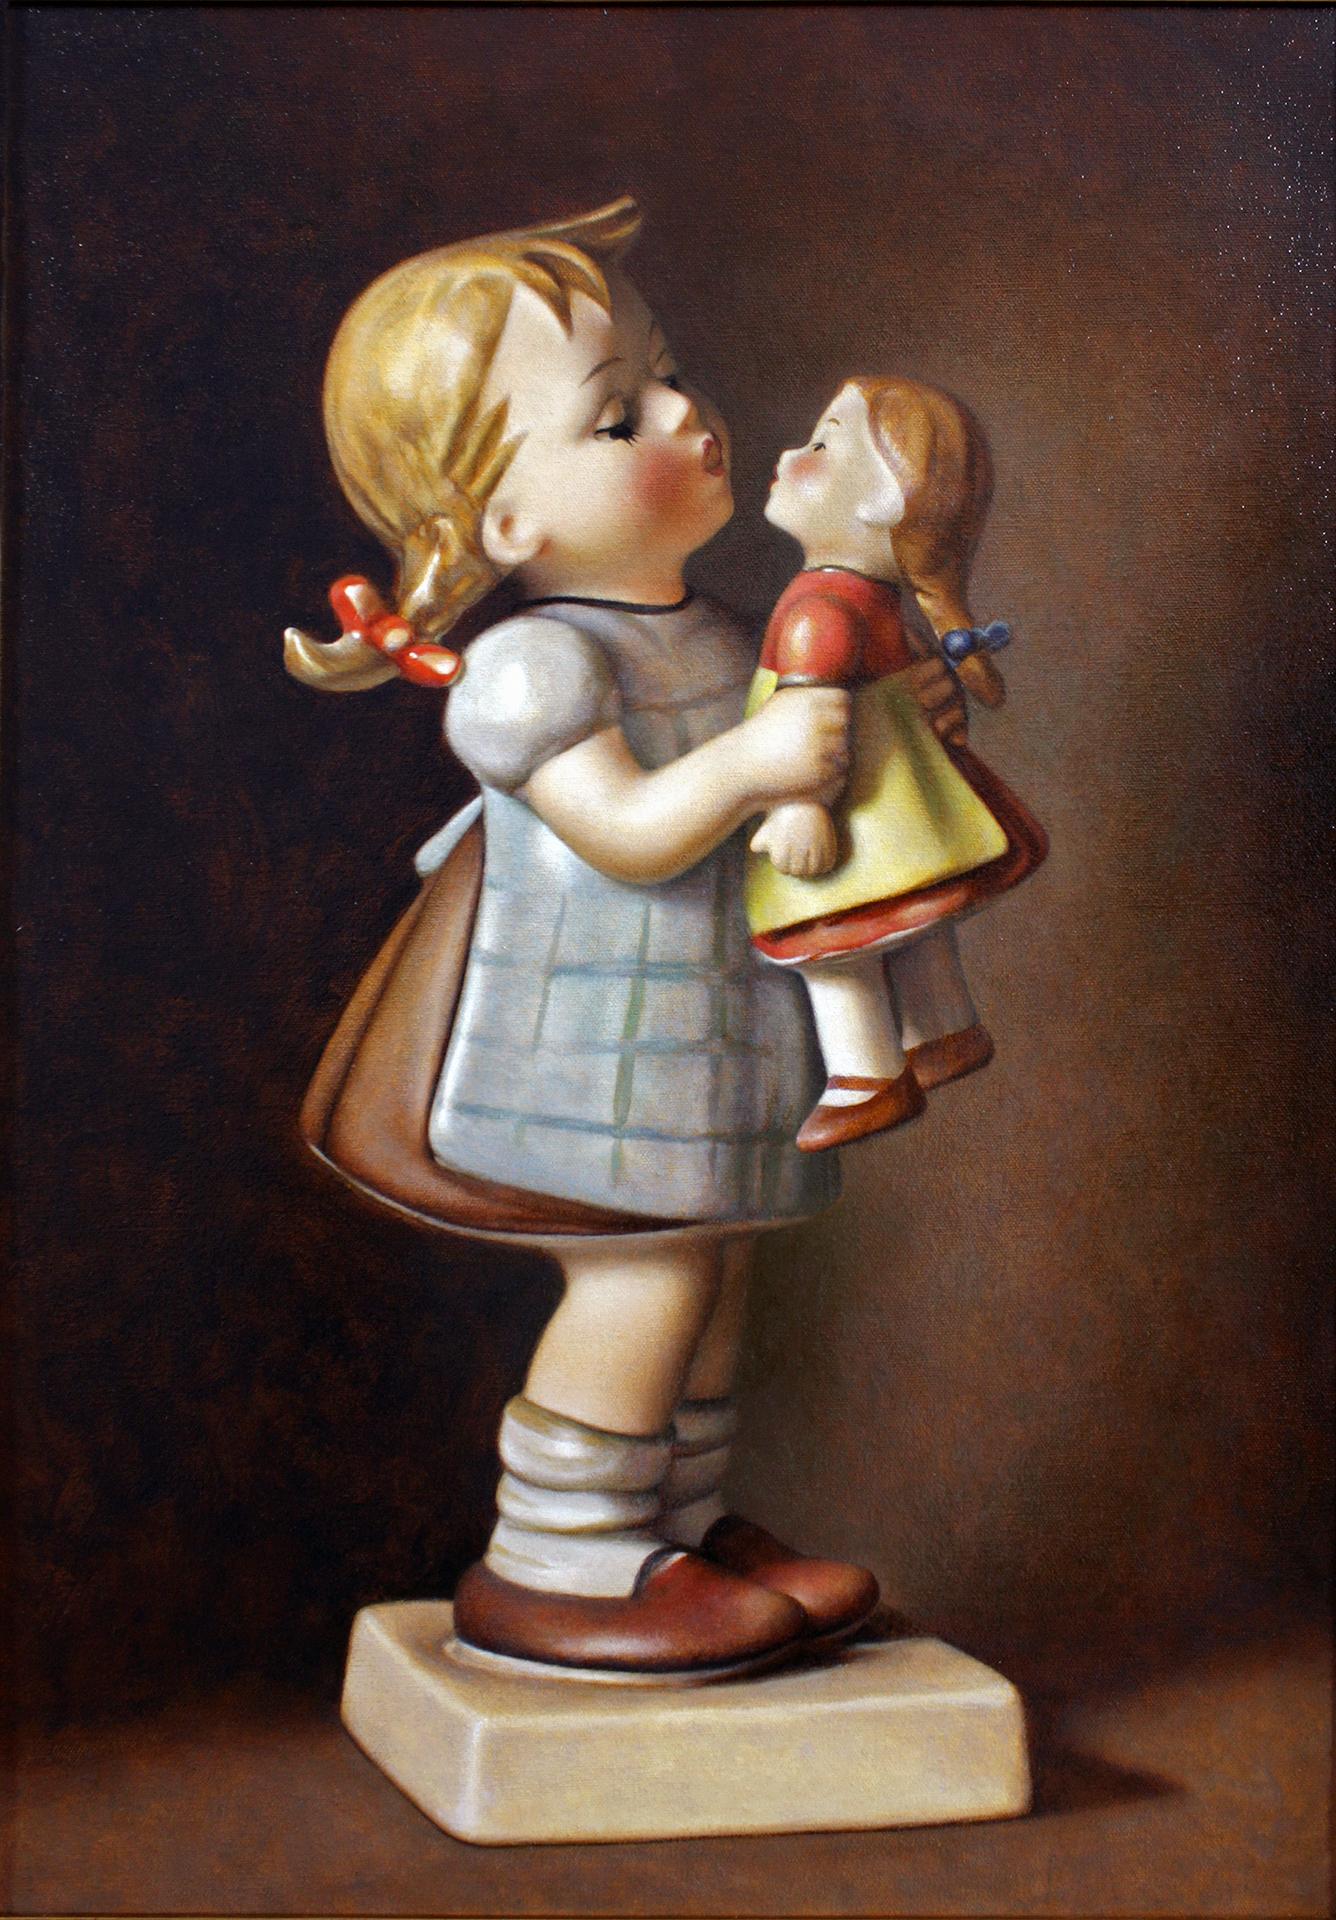 "Kiss Me, oil on canvas, 18"" x 26"", 2015"